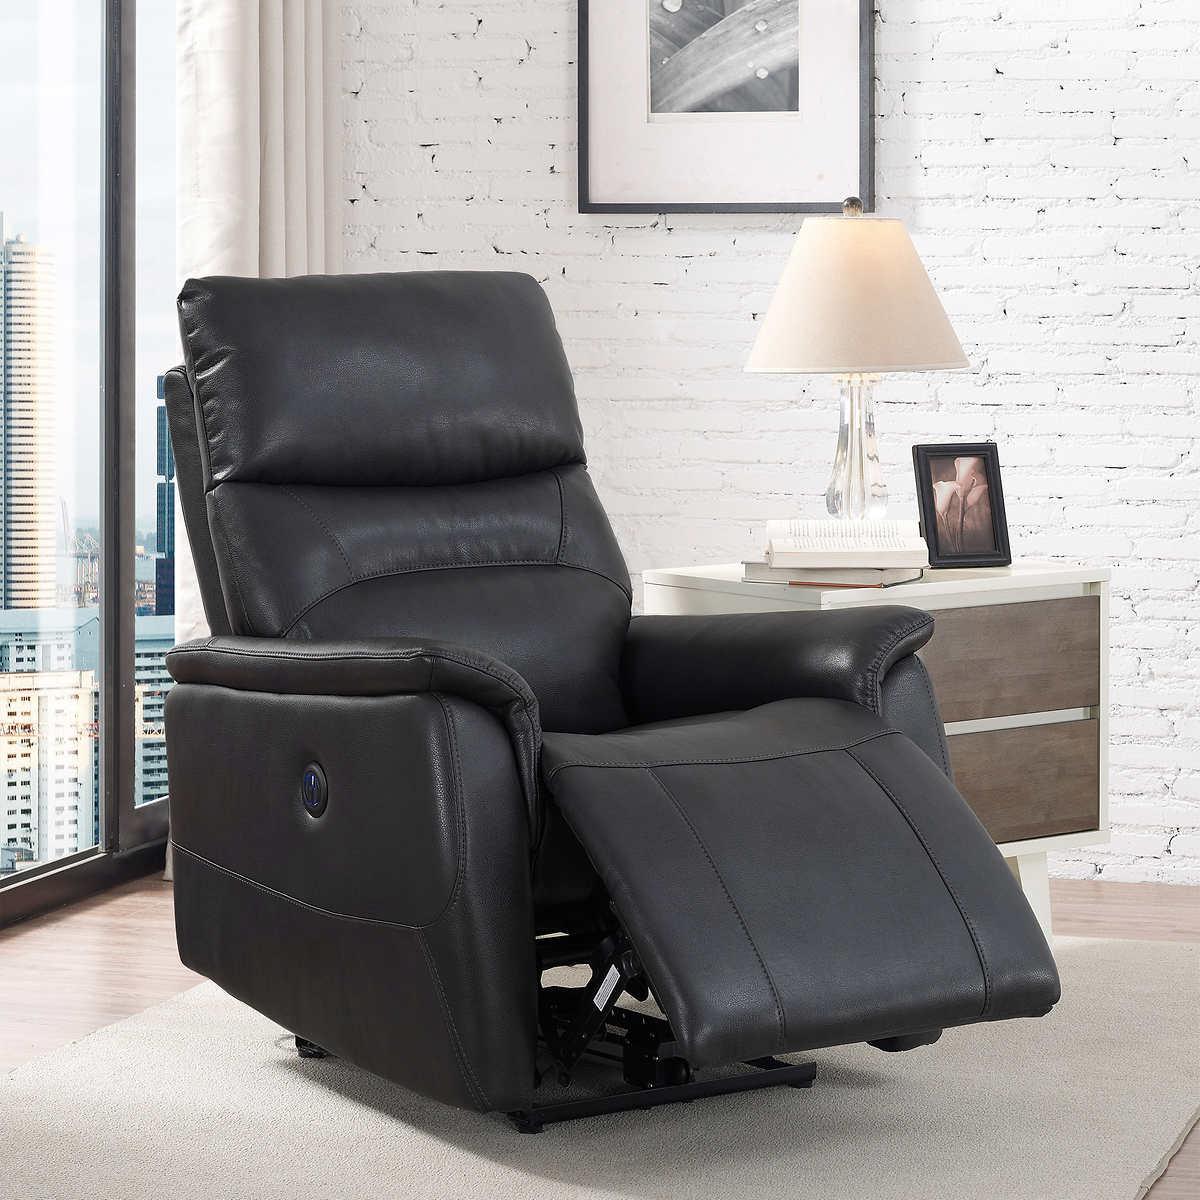 Pulaski Wheeler power chair